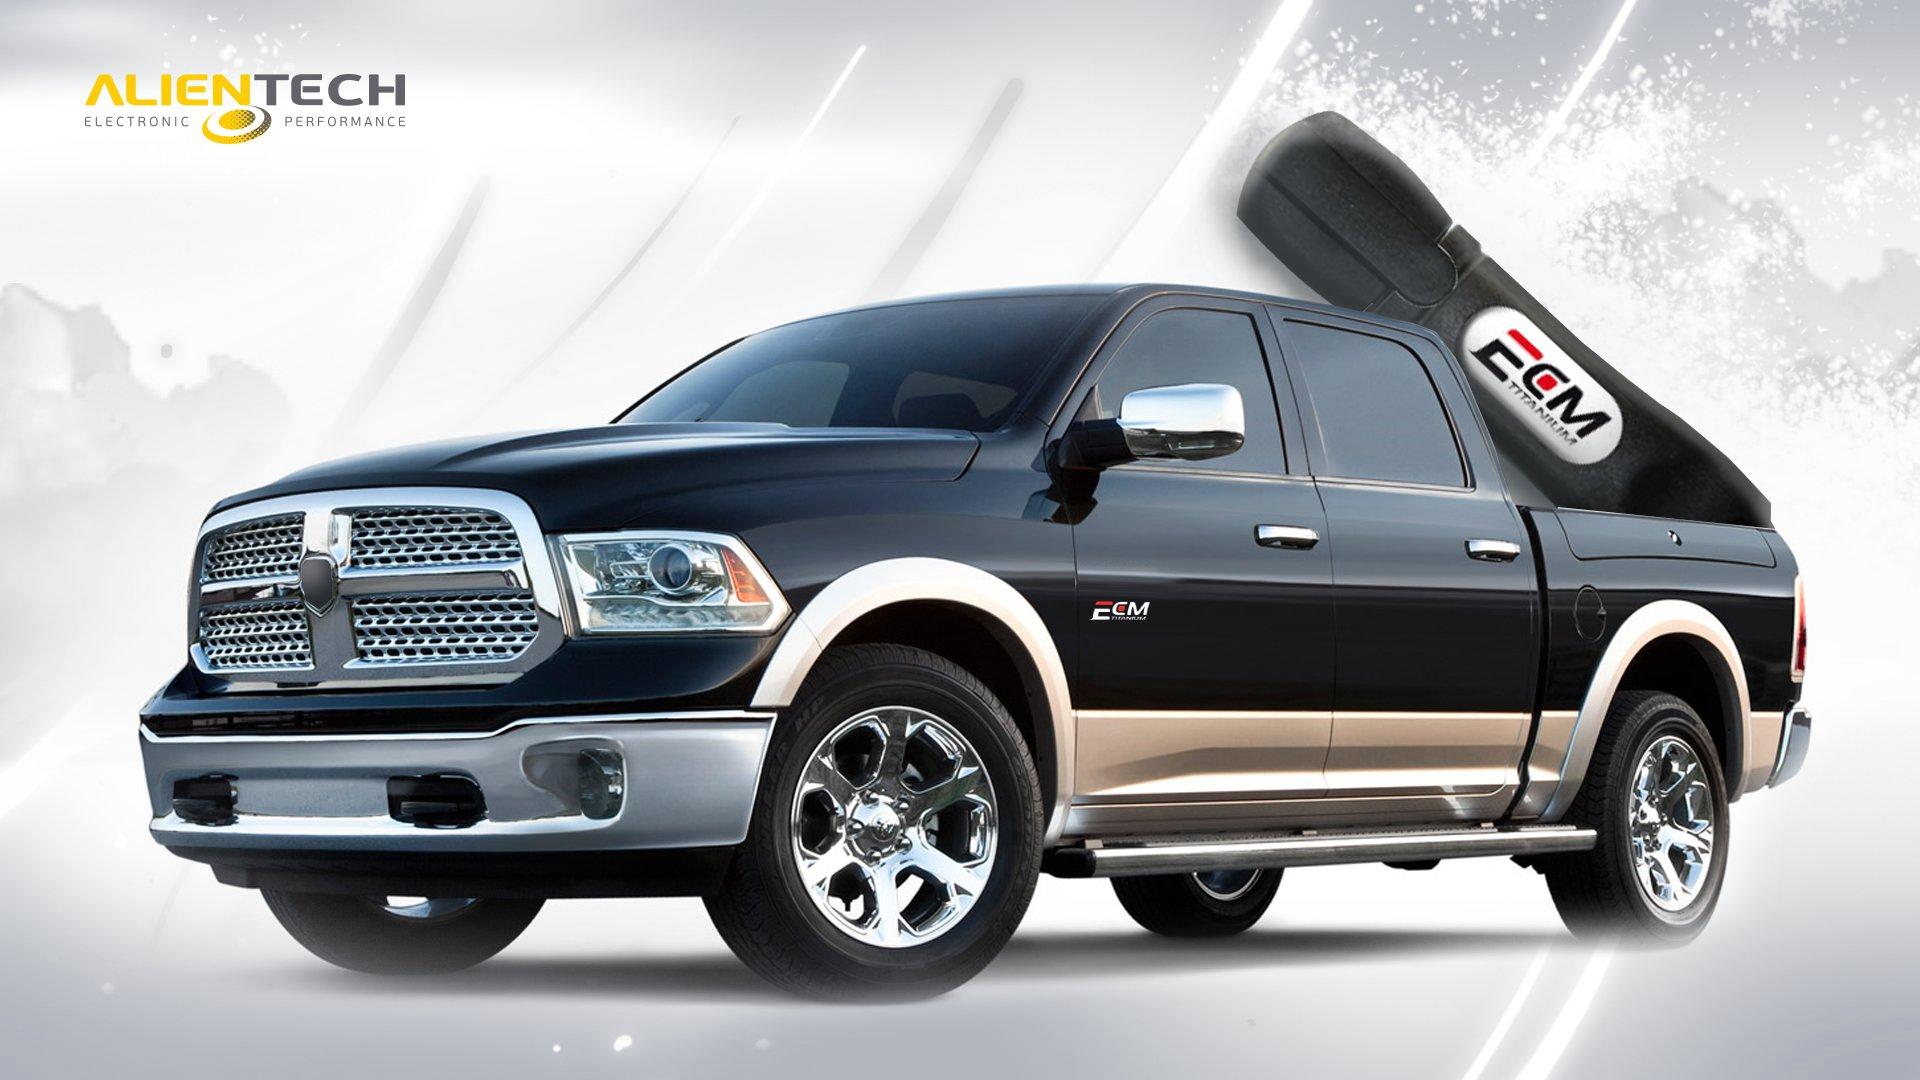 Alientech USA - 2014 Dodge RAM 1500 3 0 V6 EcoDiesel